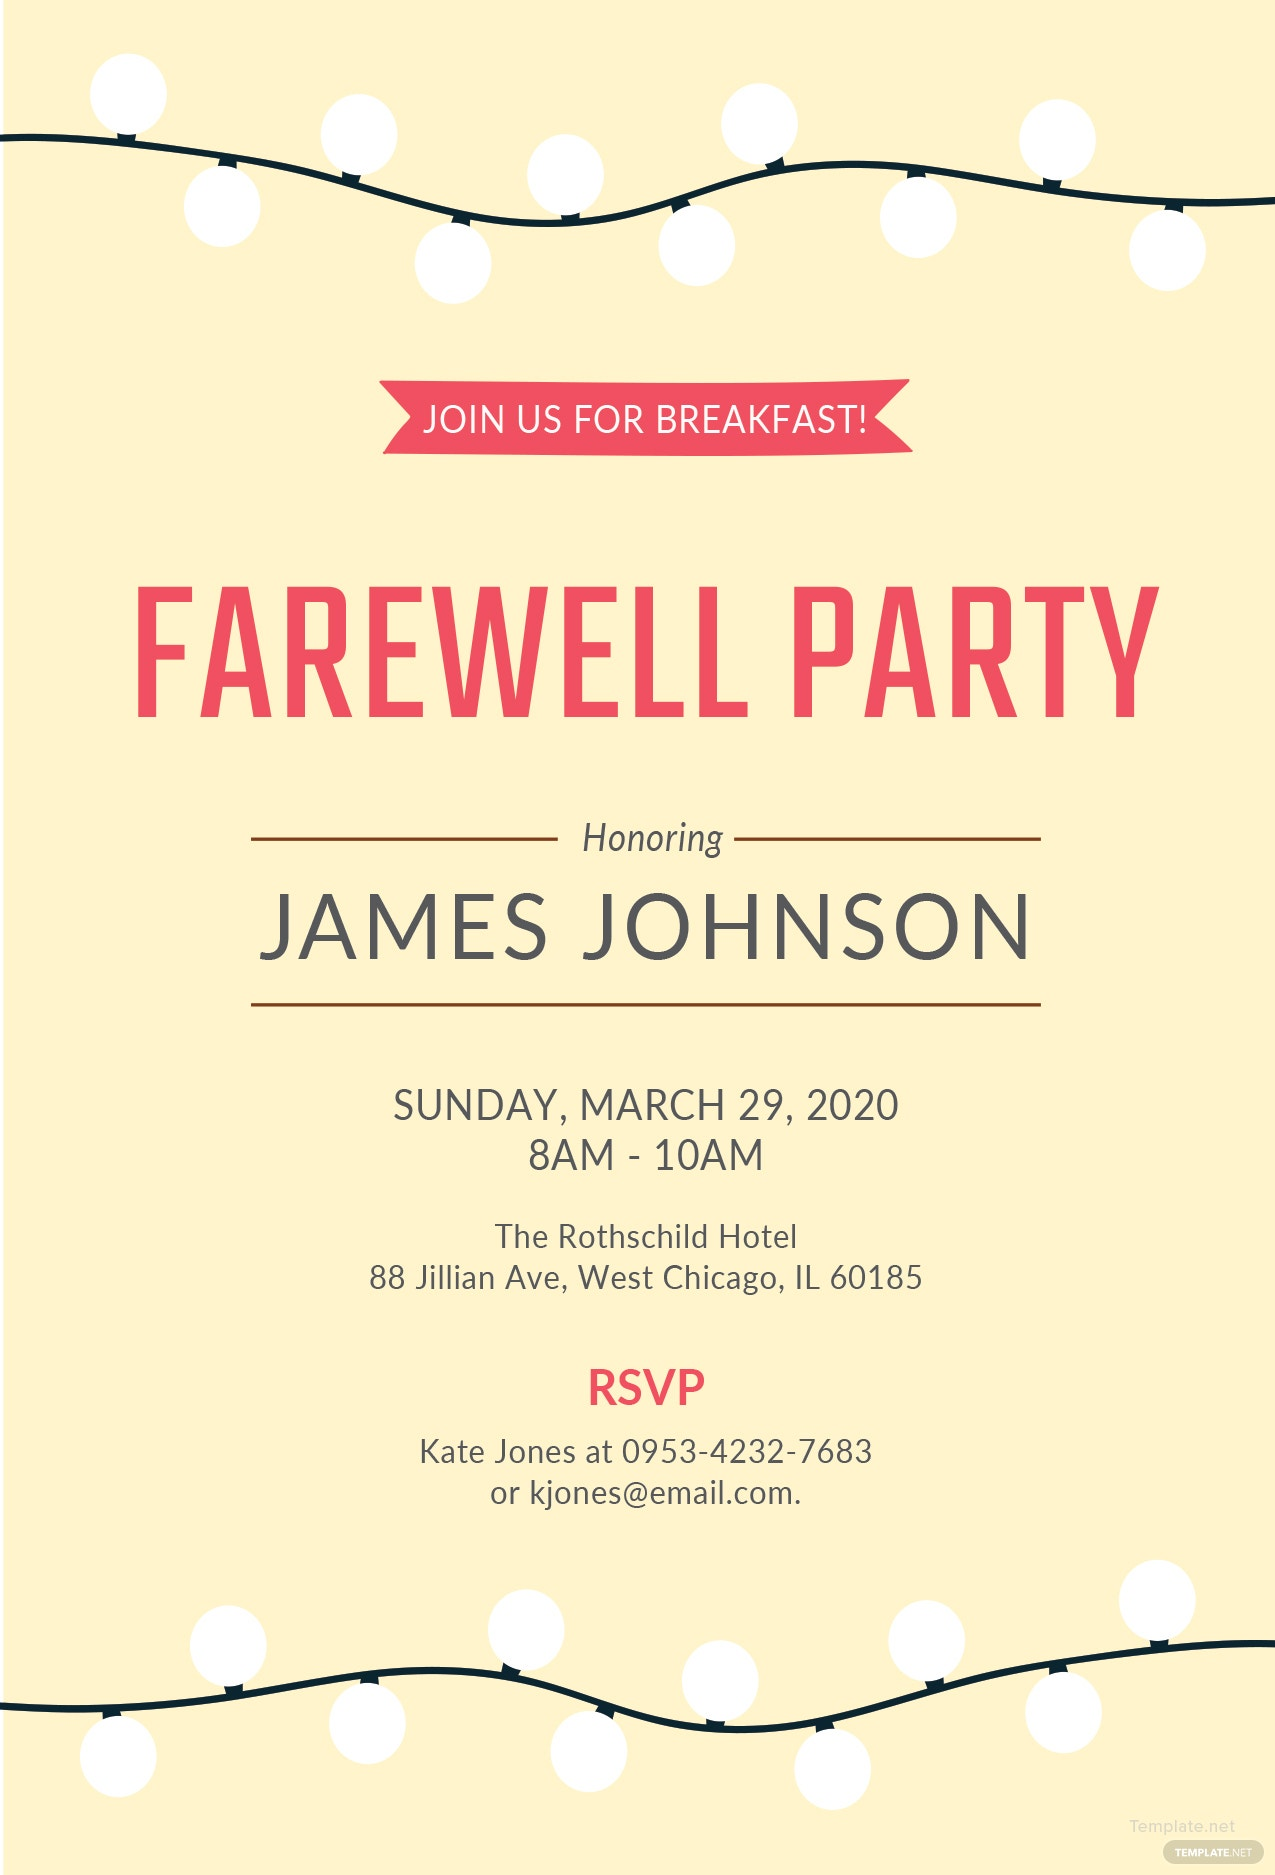 Free Farewell Breakfast Invitation Template in MS Word ...